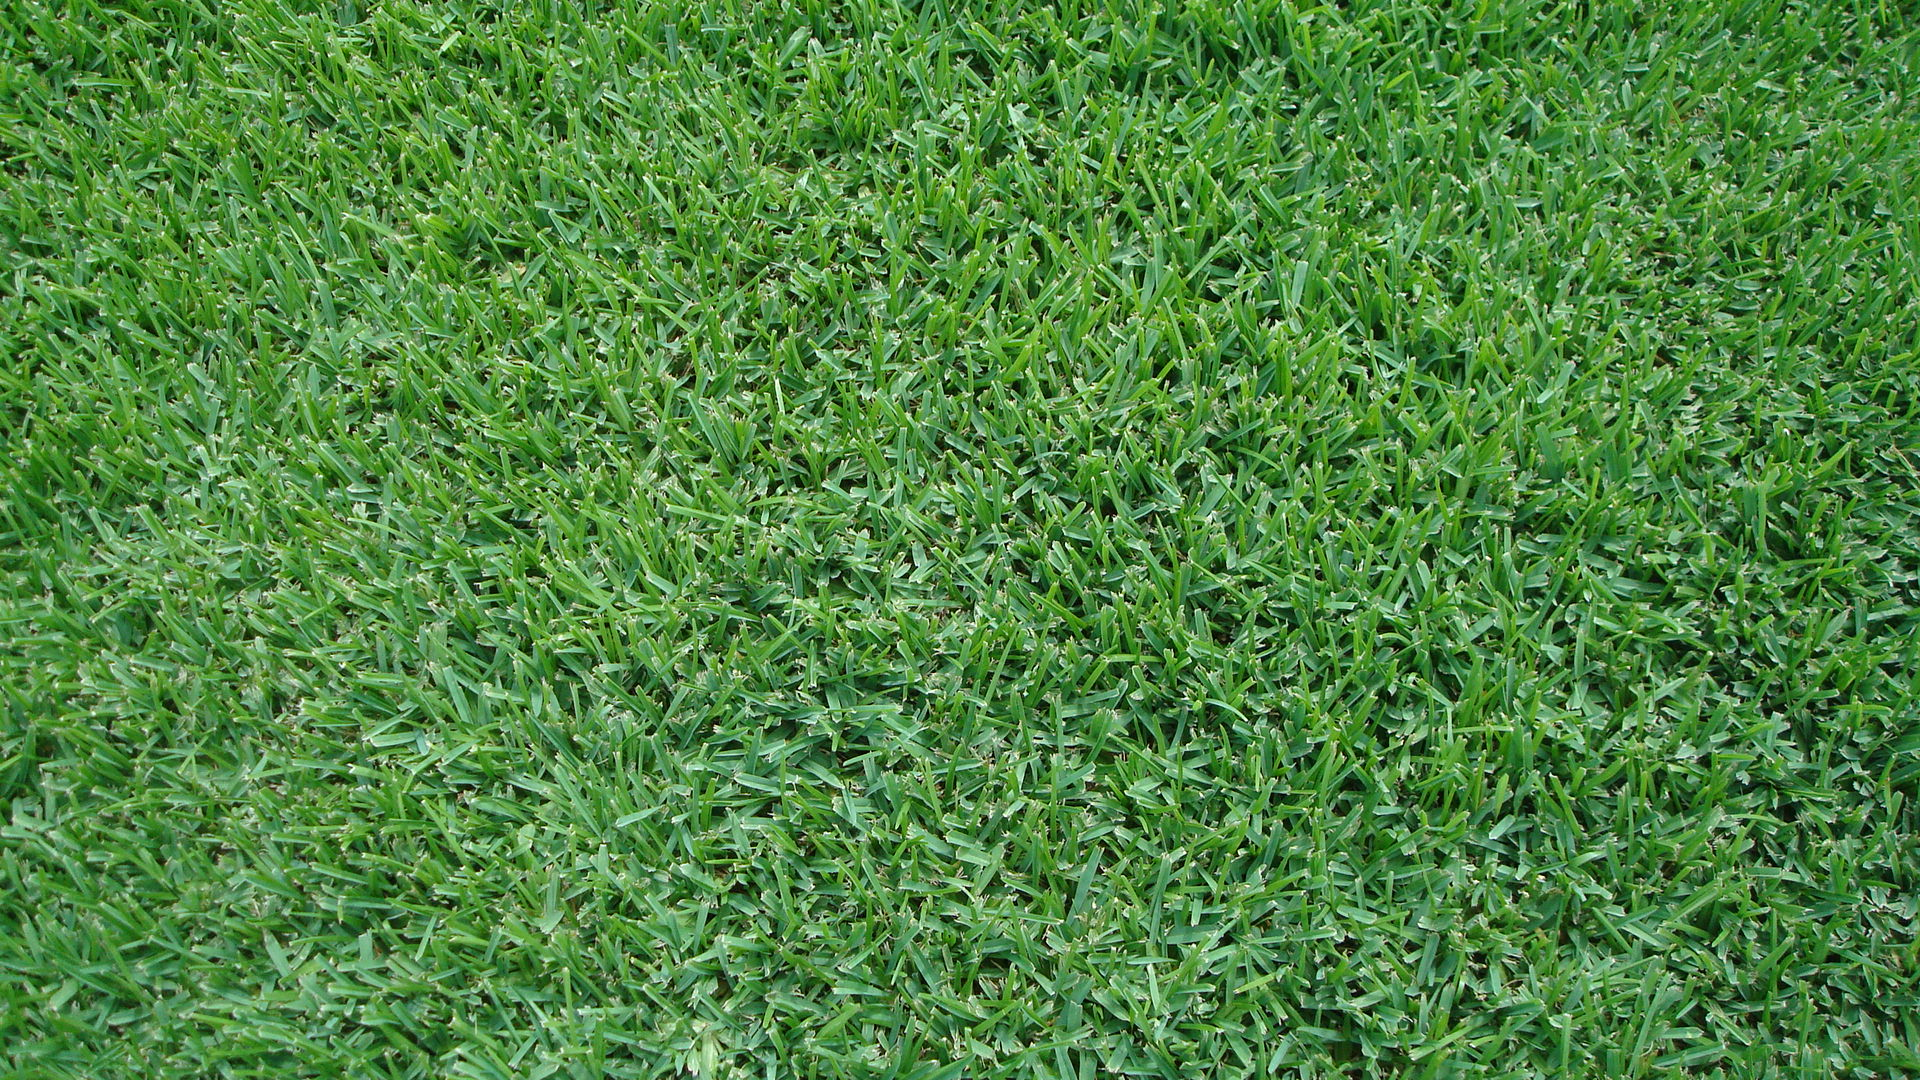 palmetto st. augustine grass sod